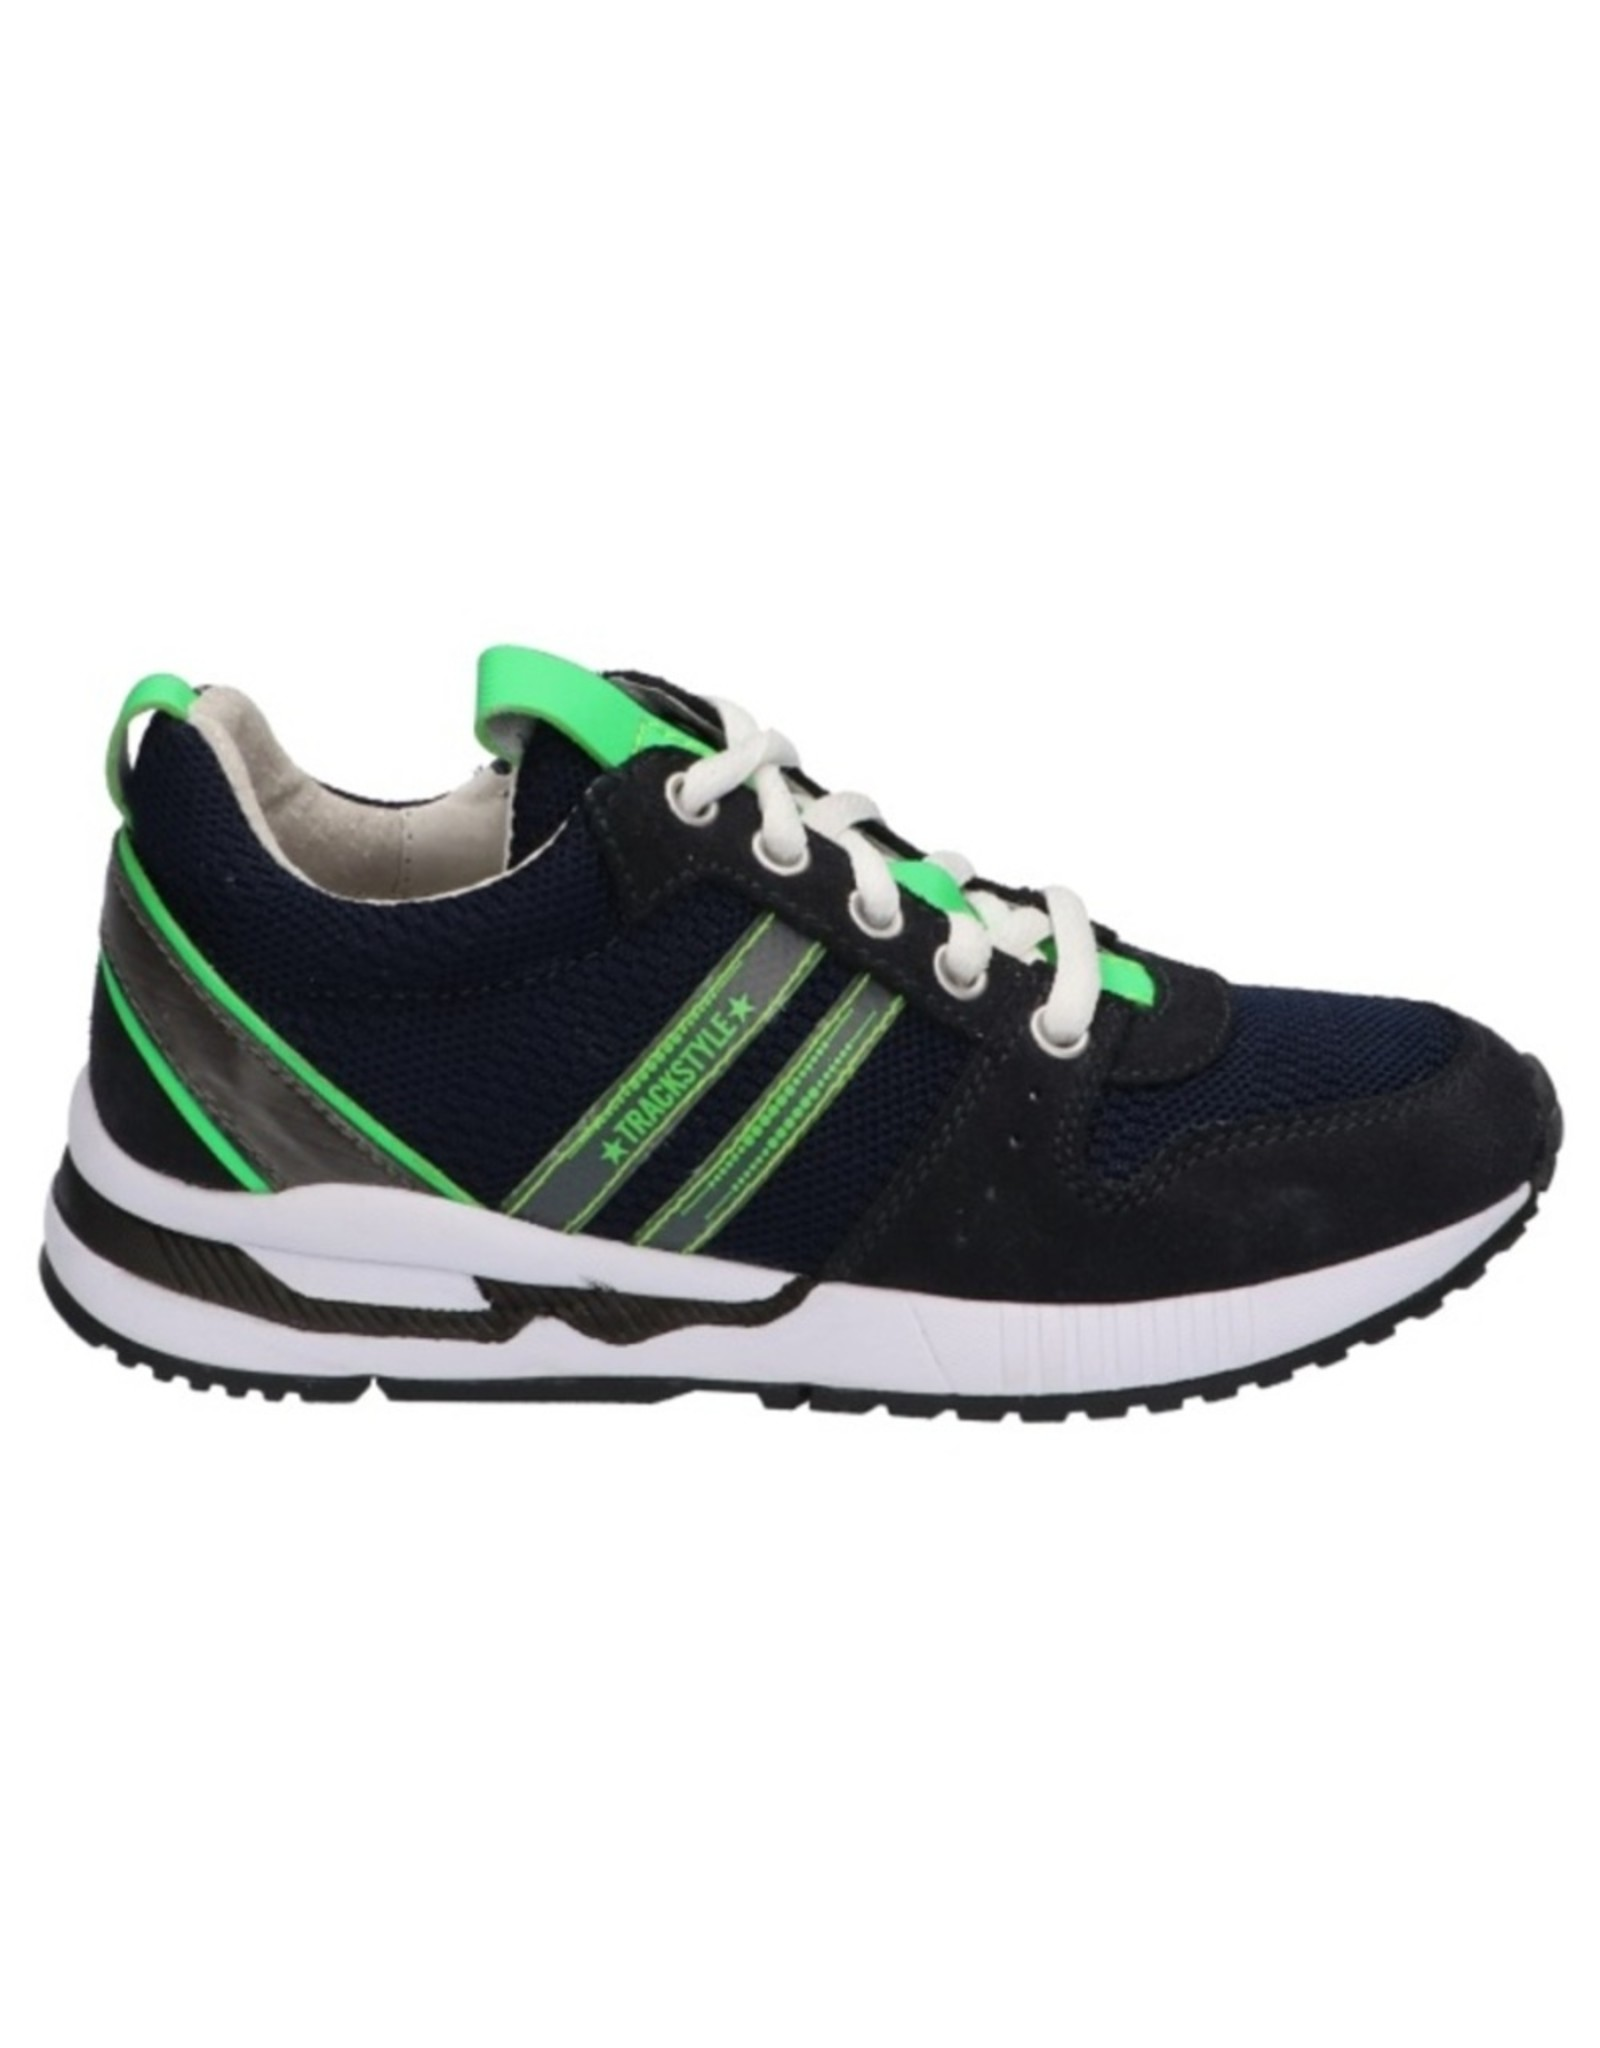 Track - Style Track - Style - Jongens Sneaker Navy